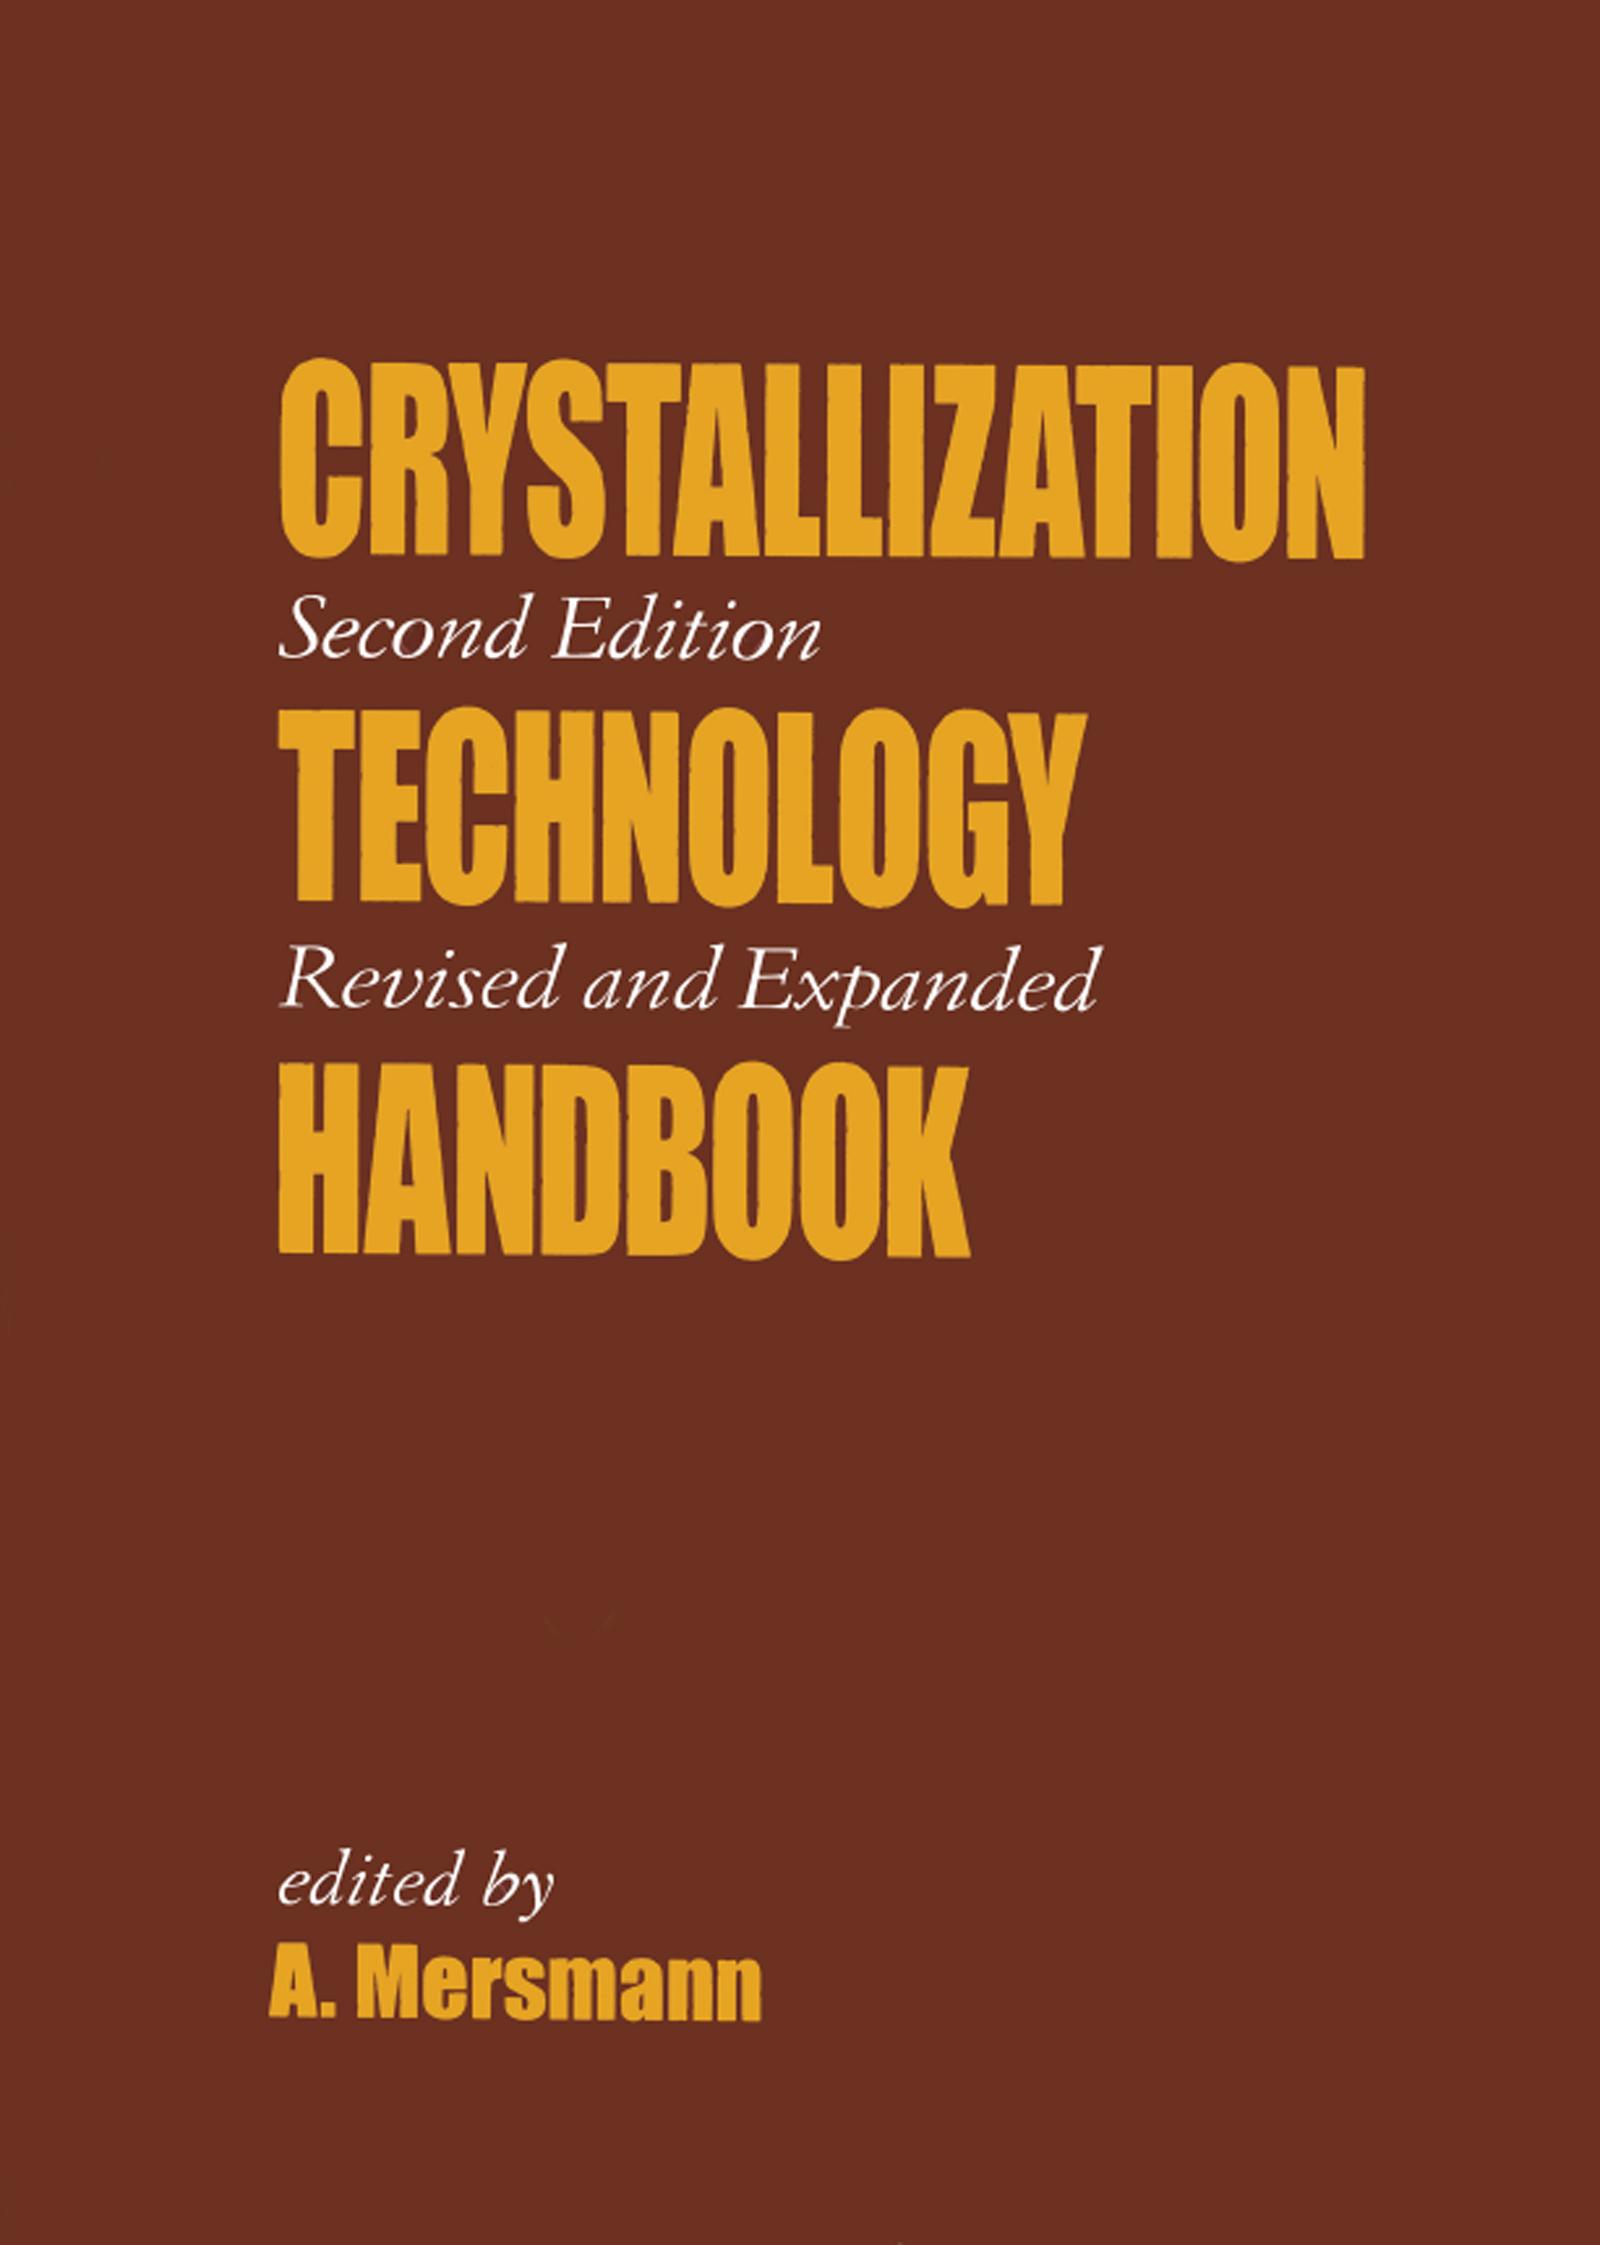 Crystallization Technology Handbook: 1st Edition (Hardback) book cover